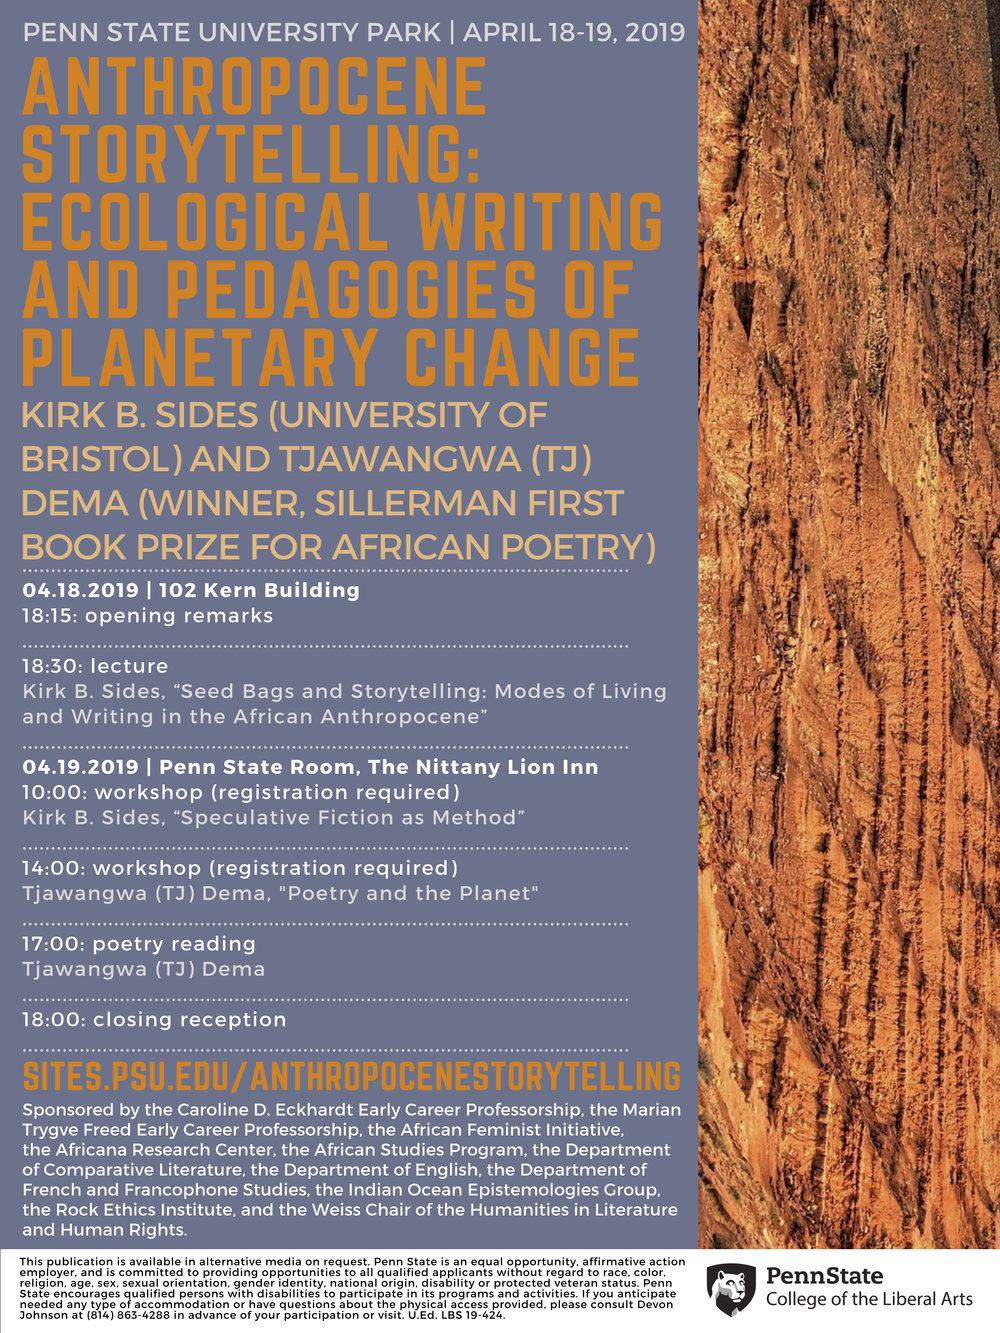 Anthropocene Storytelling - Poster and Schedule.jpg